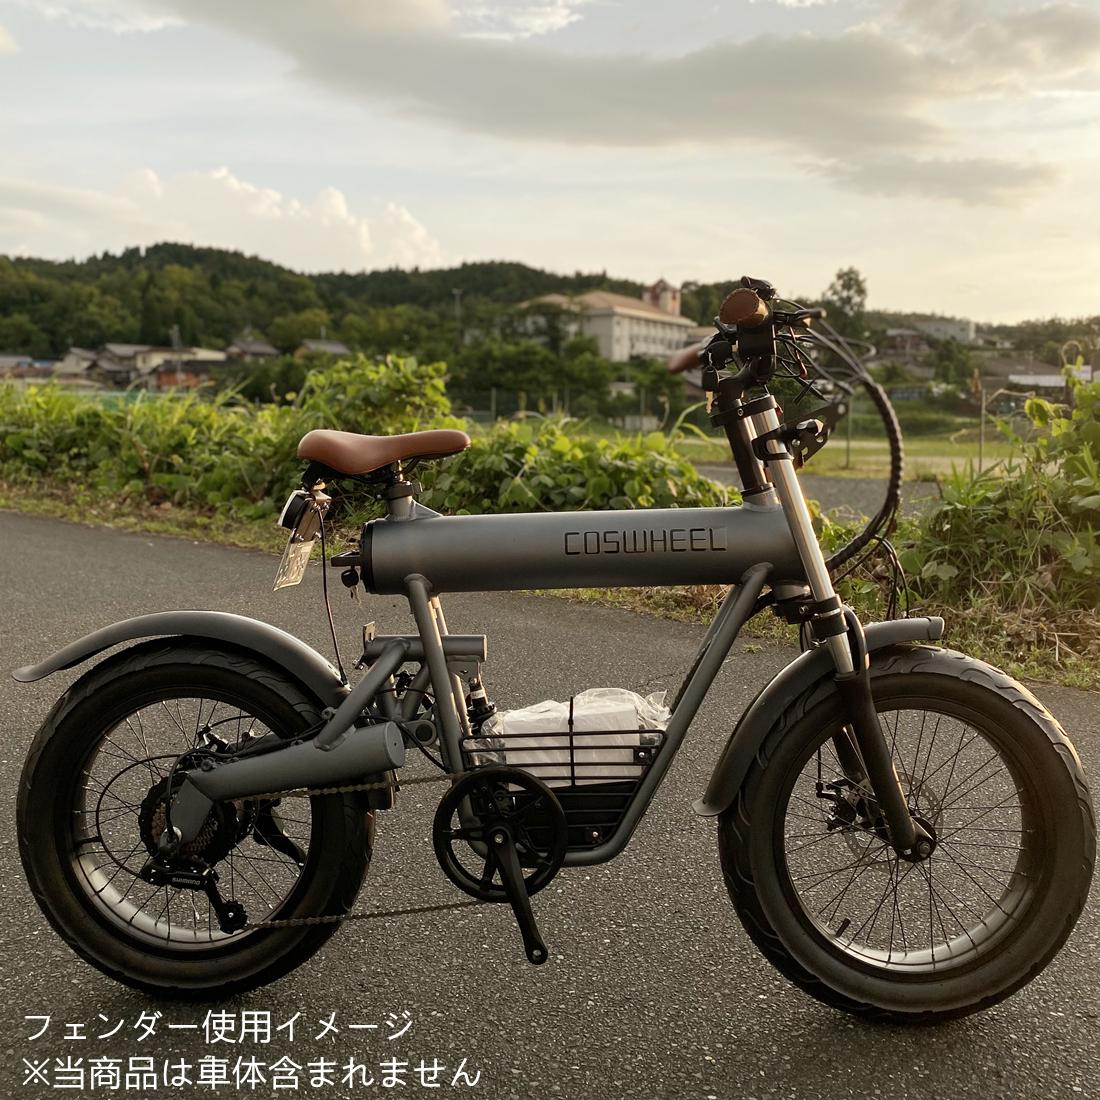 COSWHEEL SMARTEV 電動バイク専用泥除けフェンダー【前後セット】